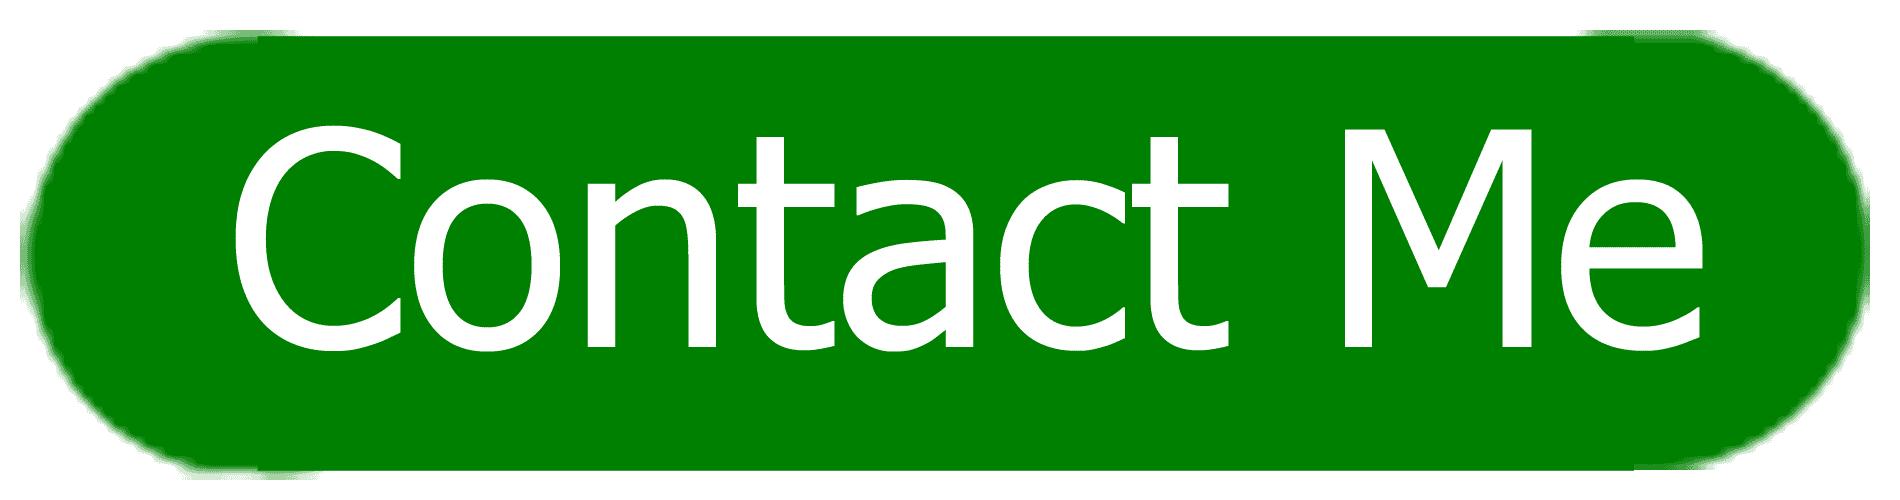 Contact Denny